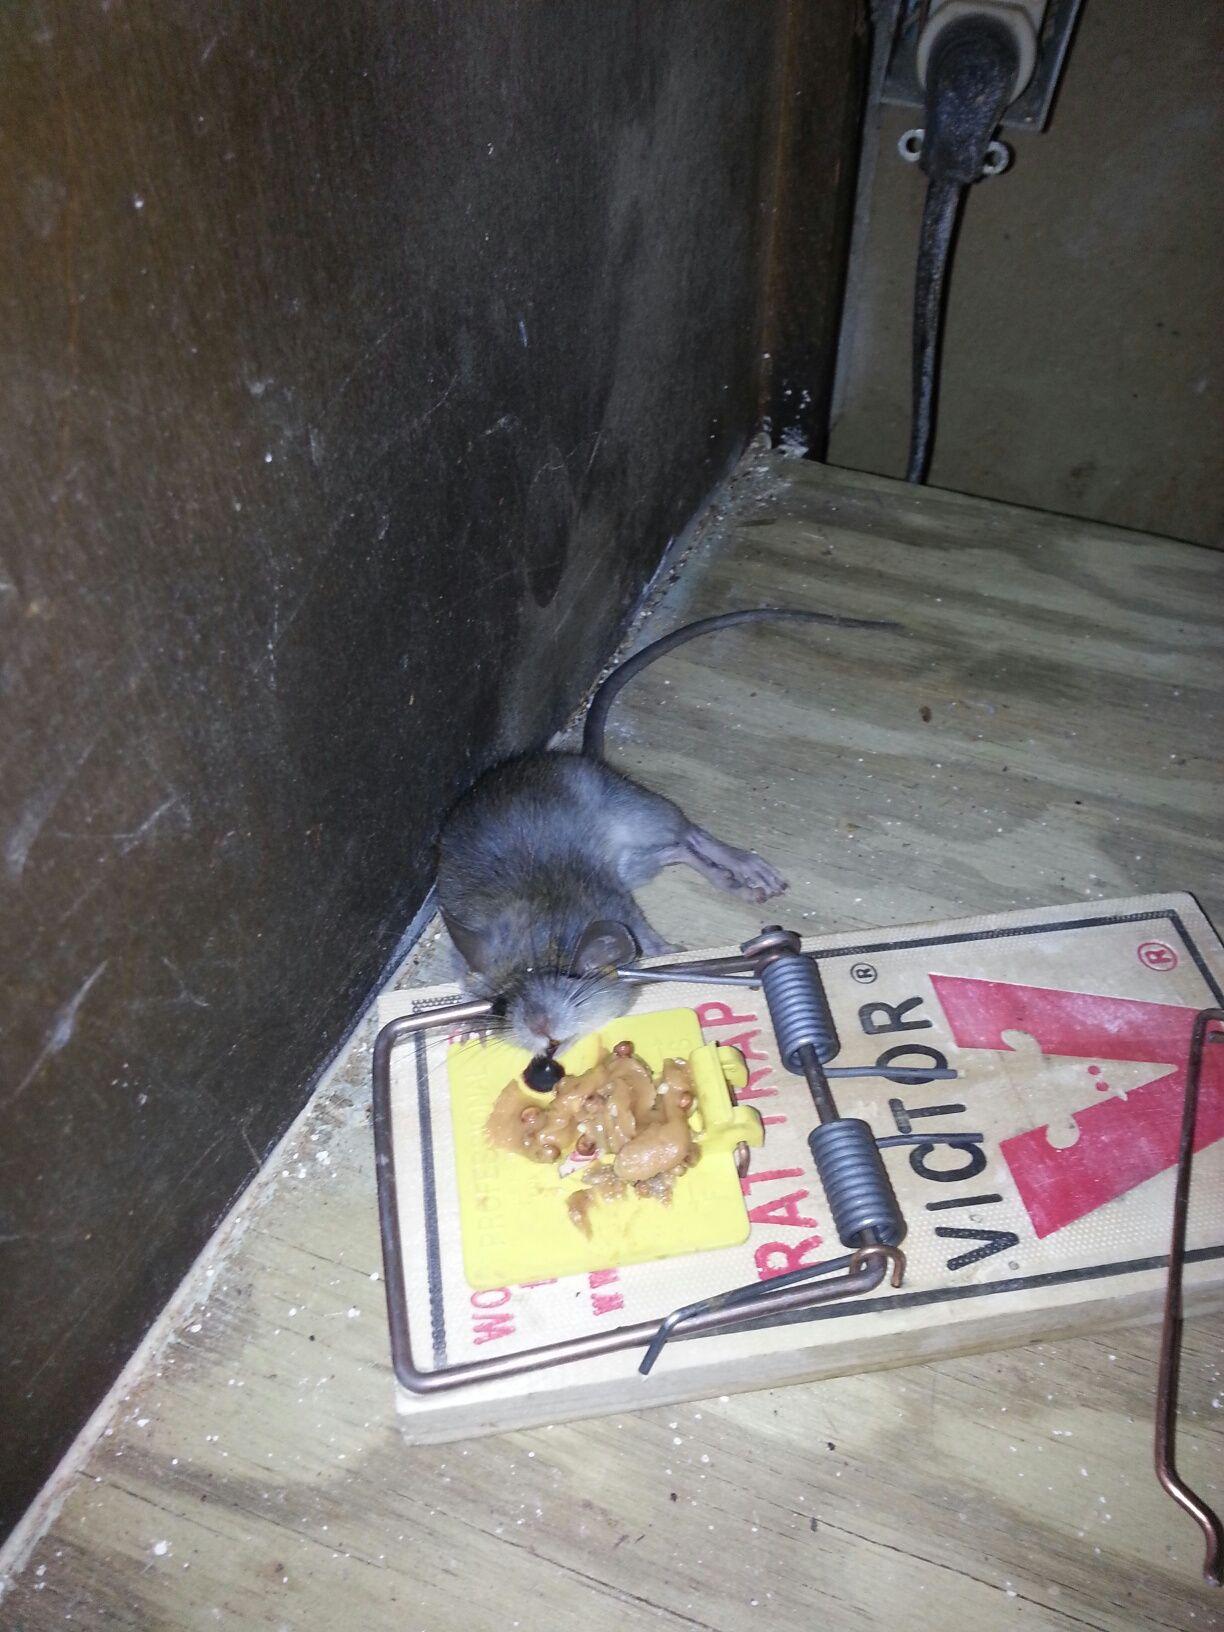 Roof Rat Caught Under A Kitchen Sink Http Www Abolishpestwildlifecontrol Com Roof Rats Rodent Control Rats